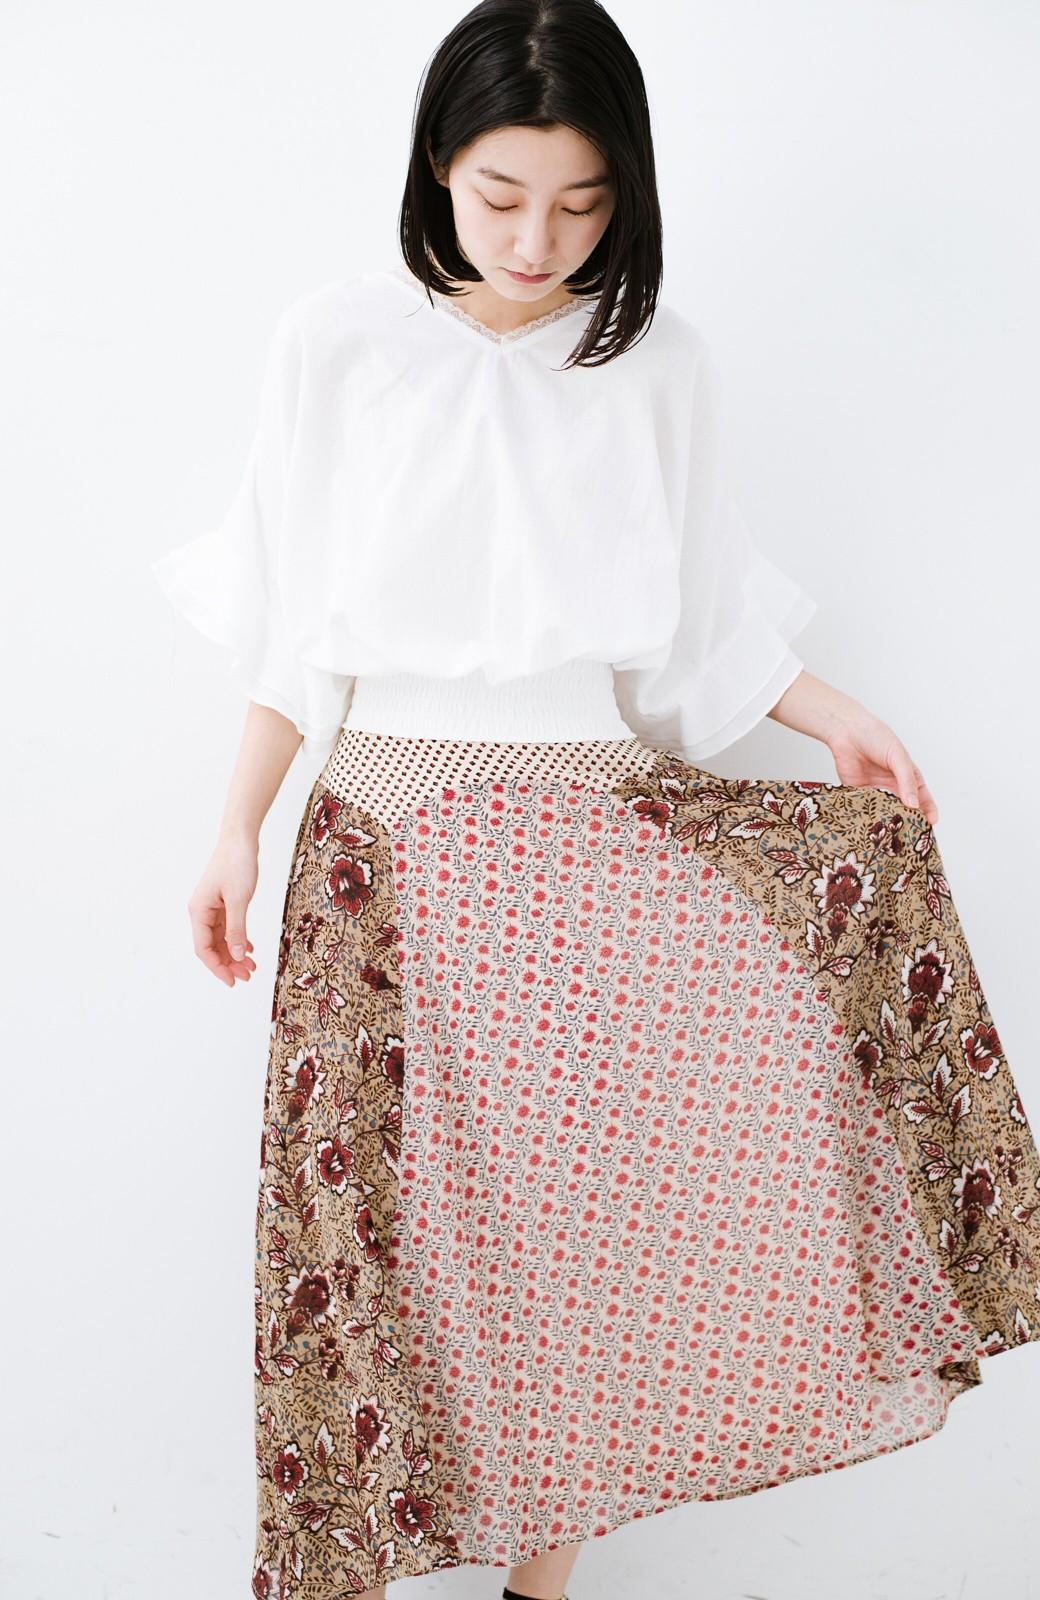 haco! 【洗濯機洗いOK】シンプルなトップスに合わせるだけでかわいくなれる MIX柄スカート <ベージュ系その他>の商品写真14